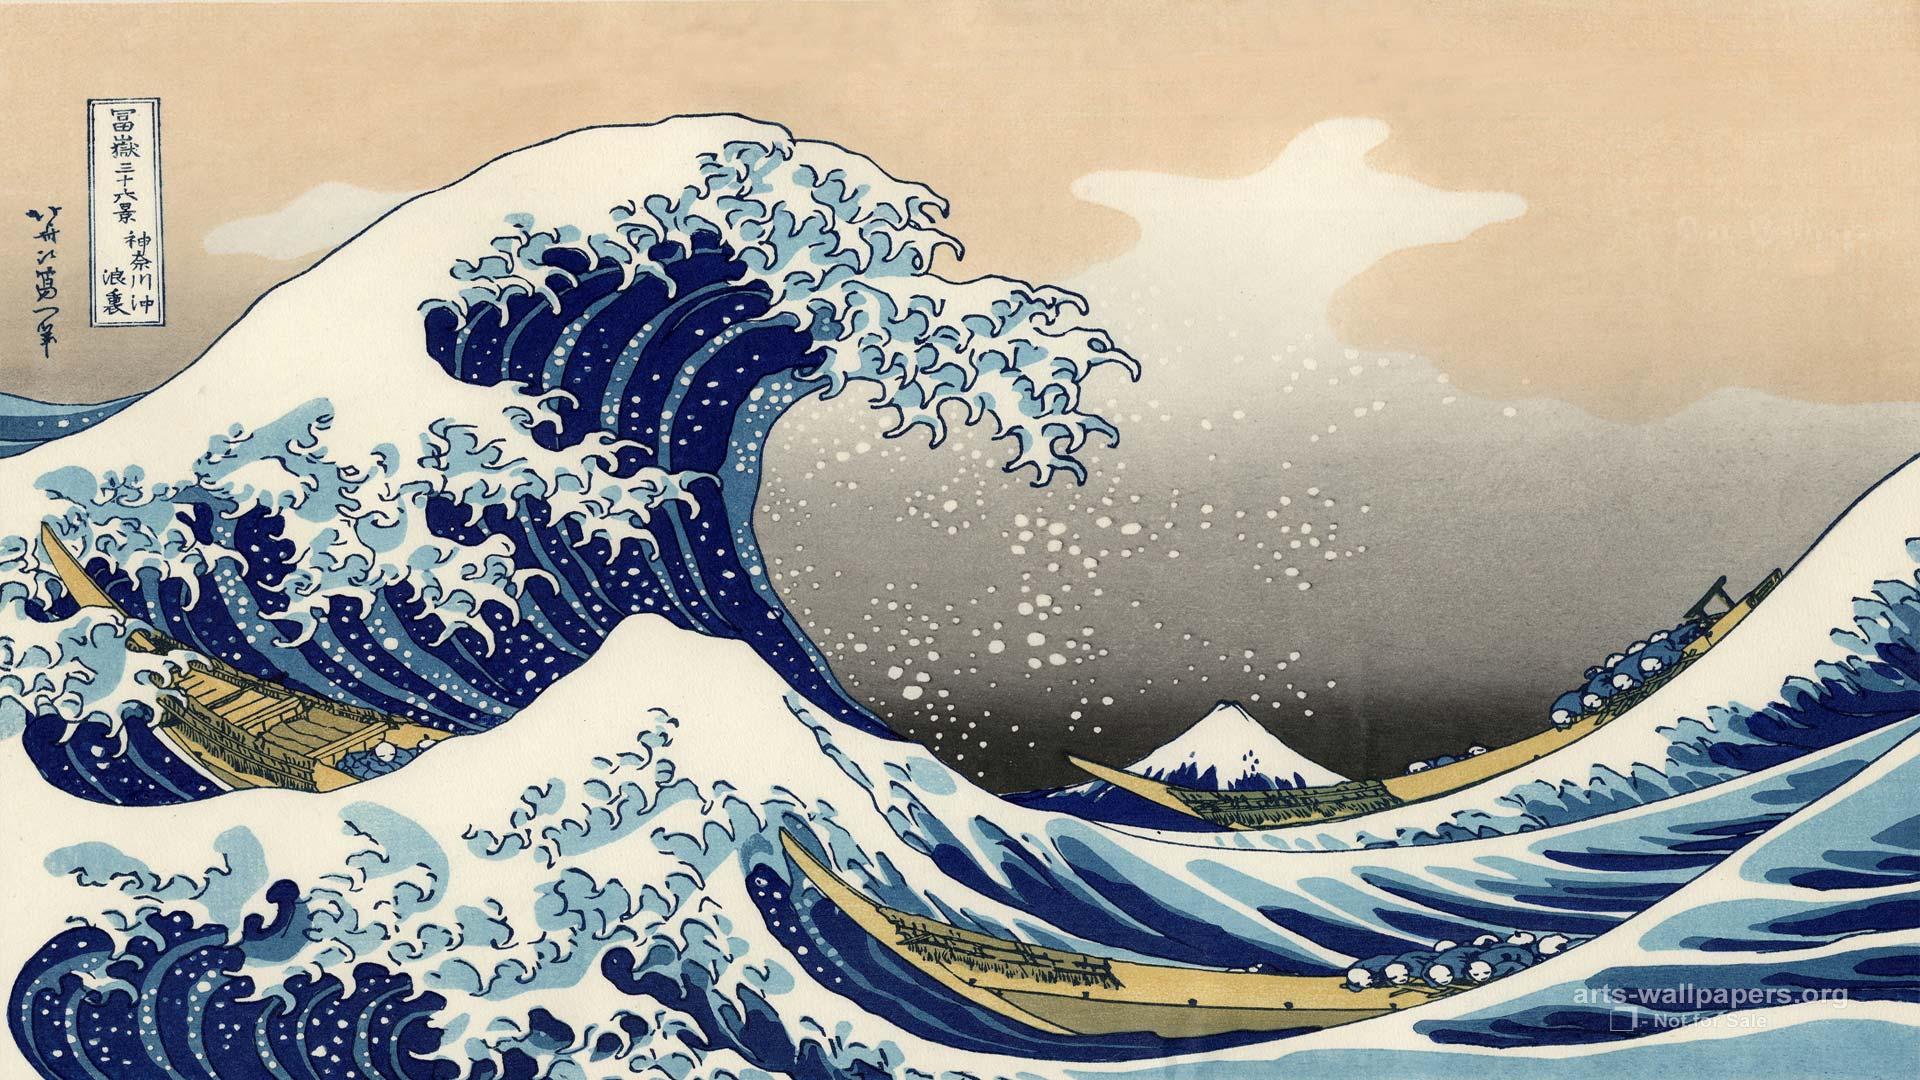 Japanese Art Wallpapers Paintings Desktop Art Backgrounds 1920x1080